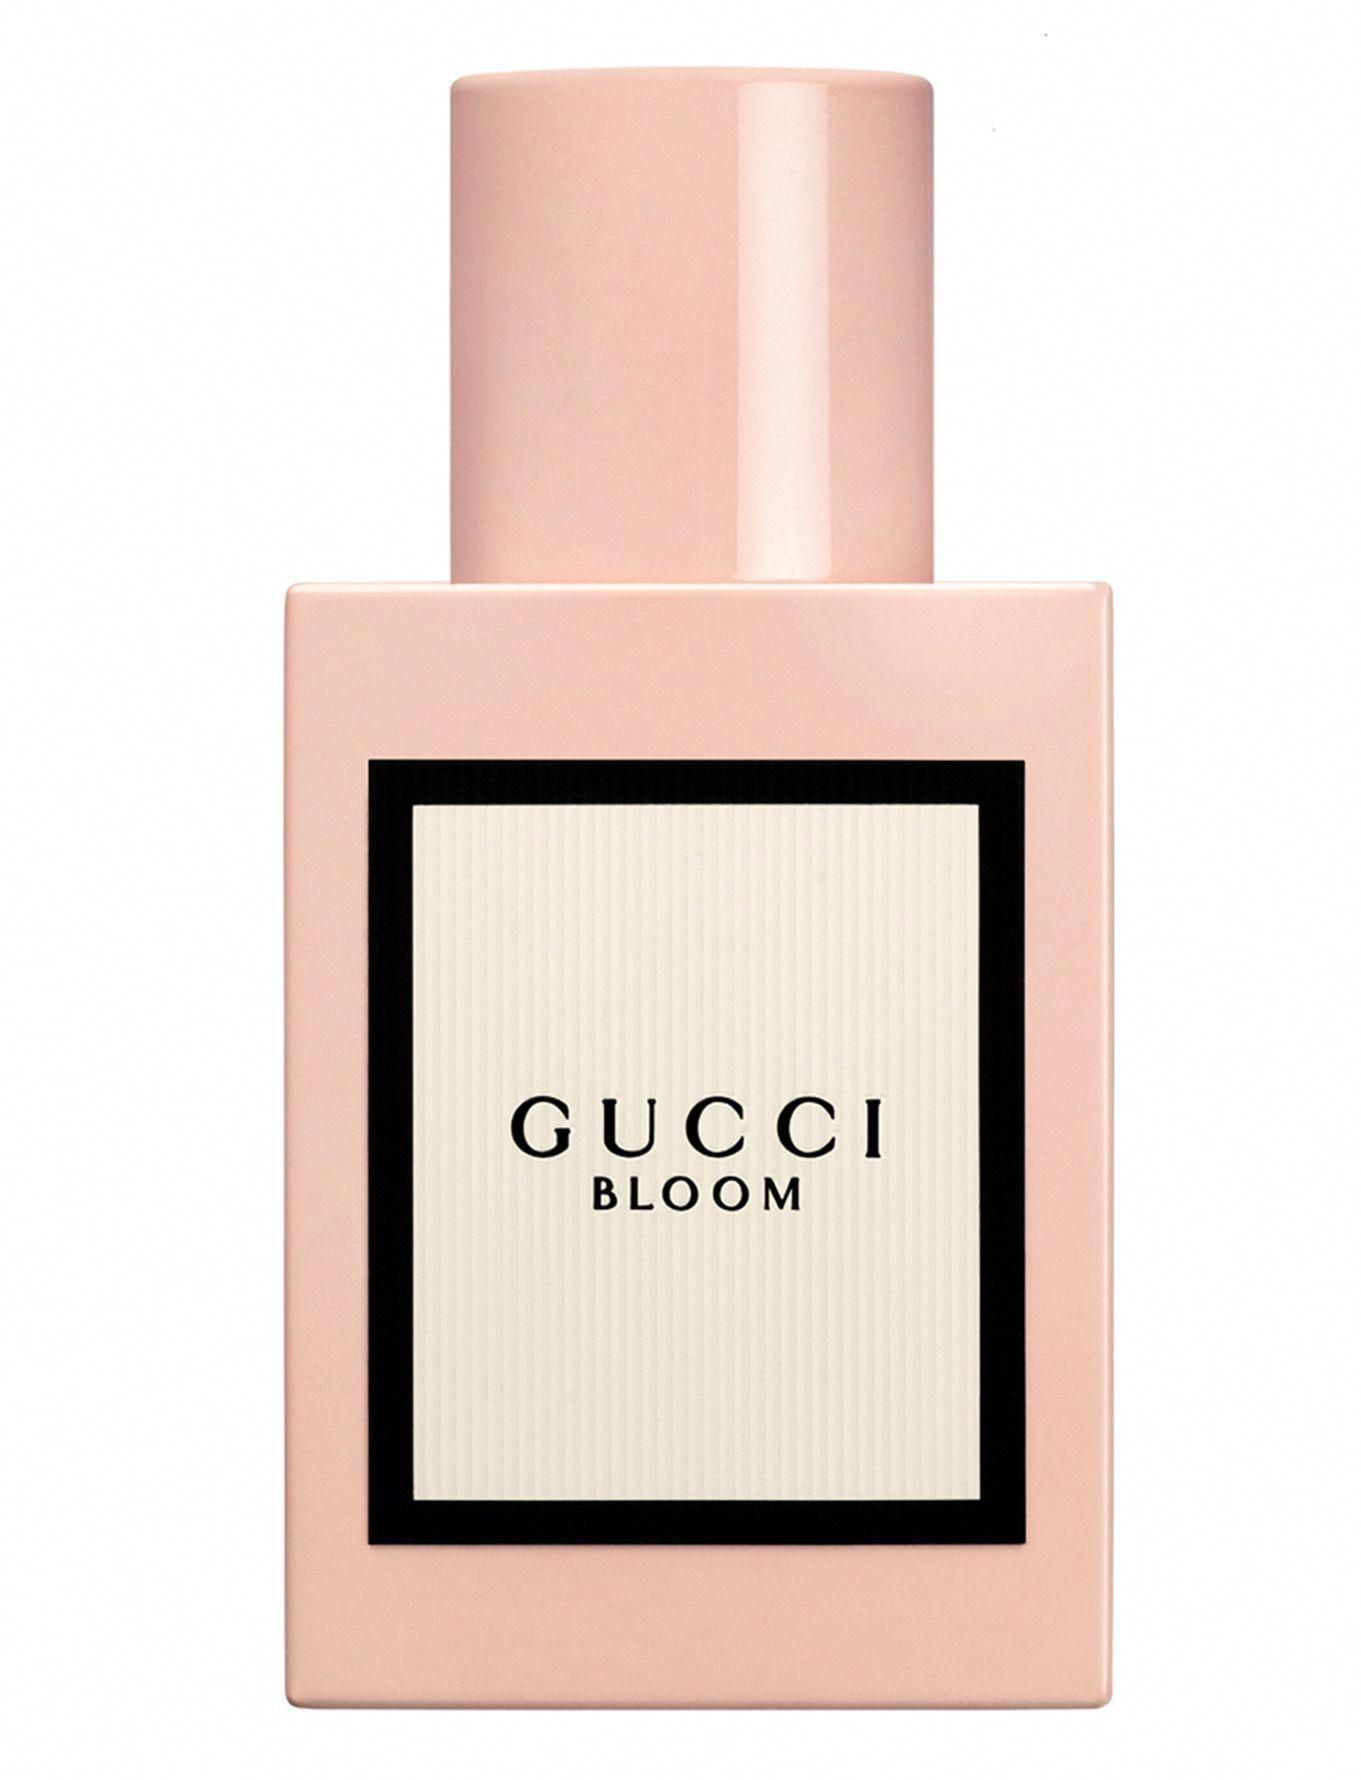 27454a3cb Gucci bloom eau de parfum 50 ml. #Womenperfumebrands | Women perfume ...